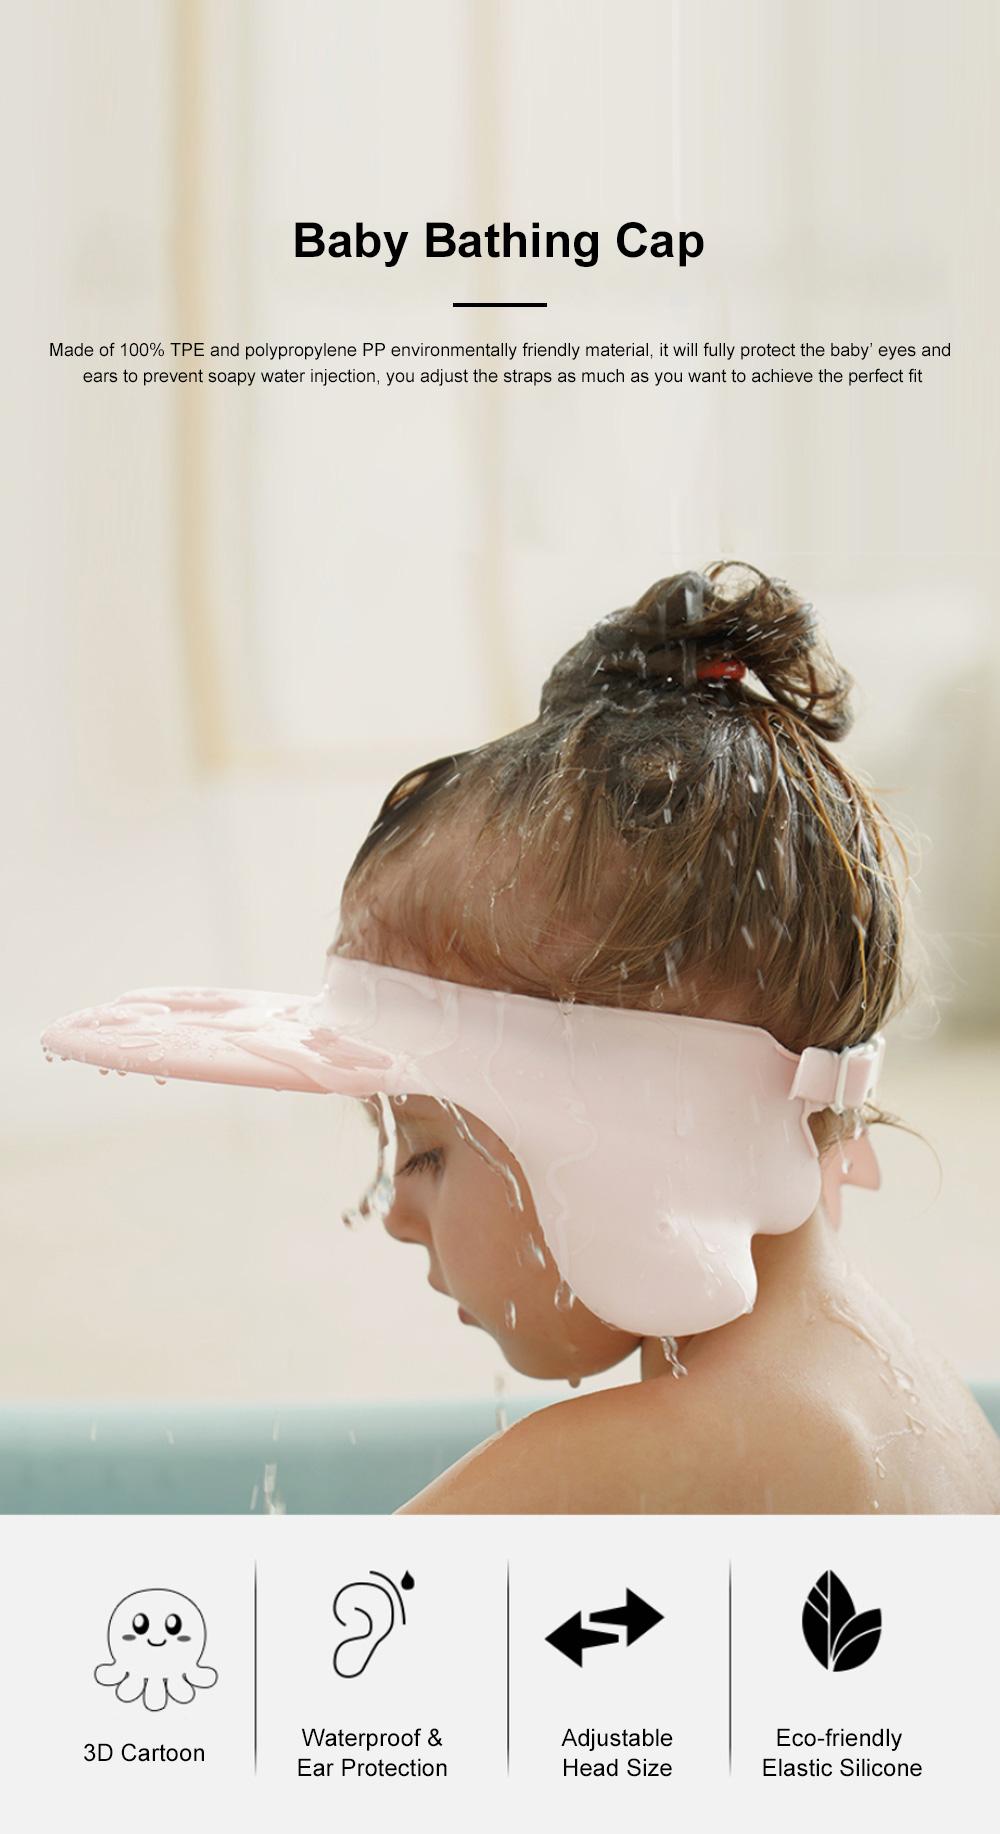 Baby Bathing Cap Shampoo Visor Bathroom Safety Caps with Adjustable Sticker Waterproof & Elastic Octopus Shampoo Hat for Showers, Bathing 0